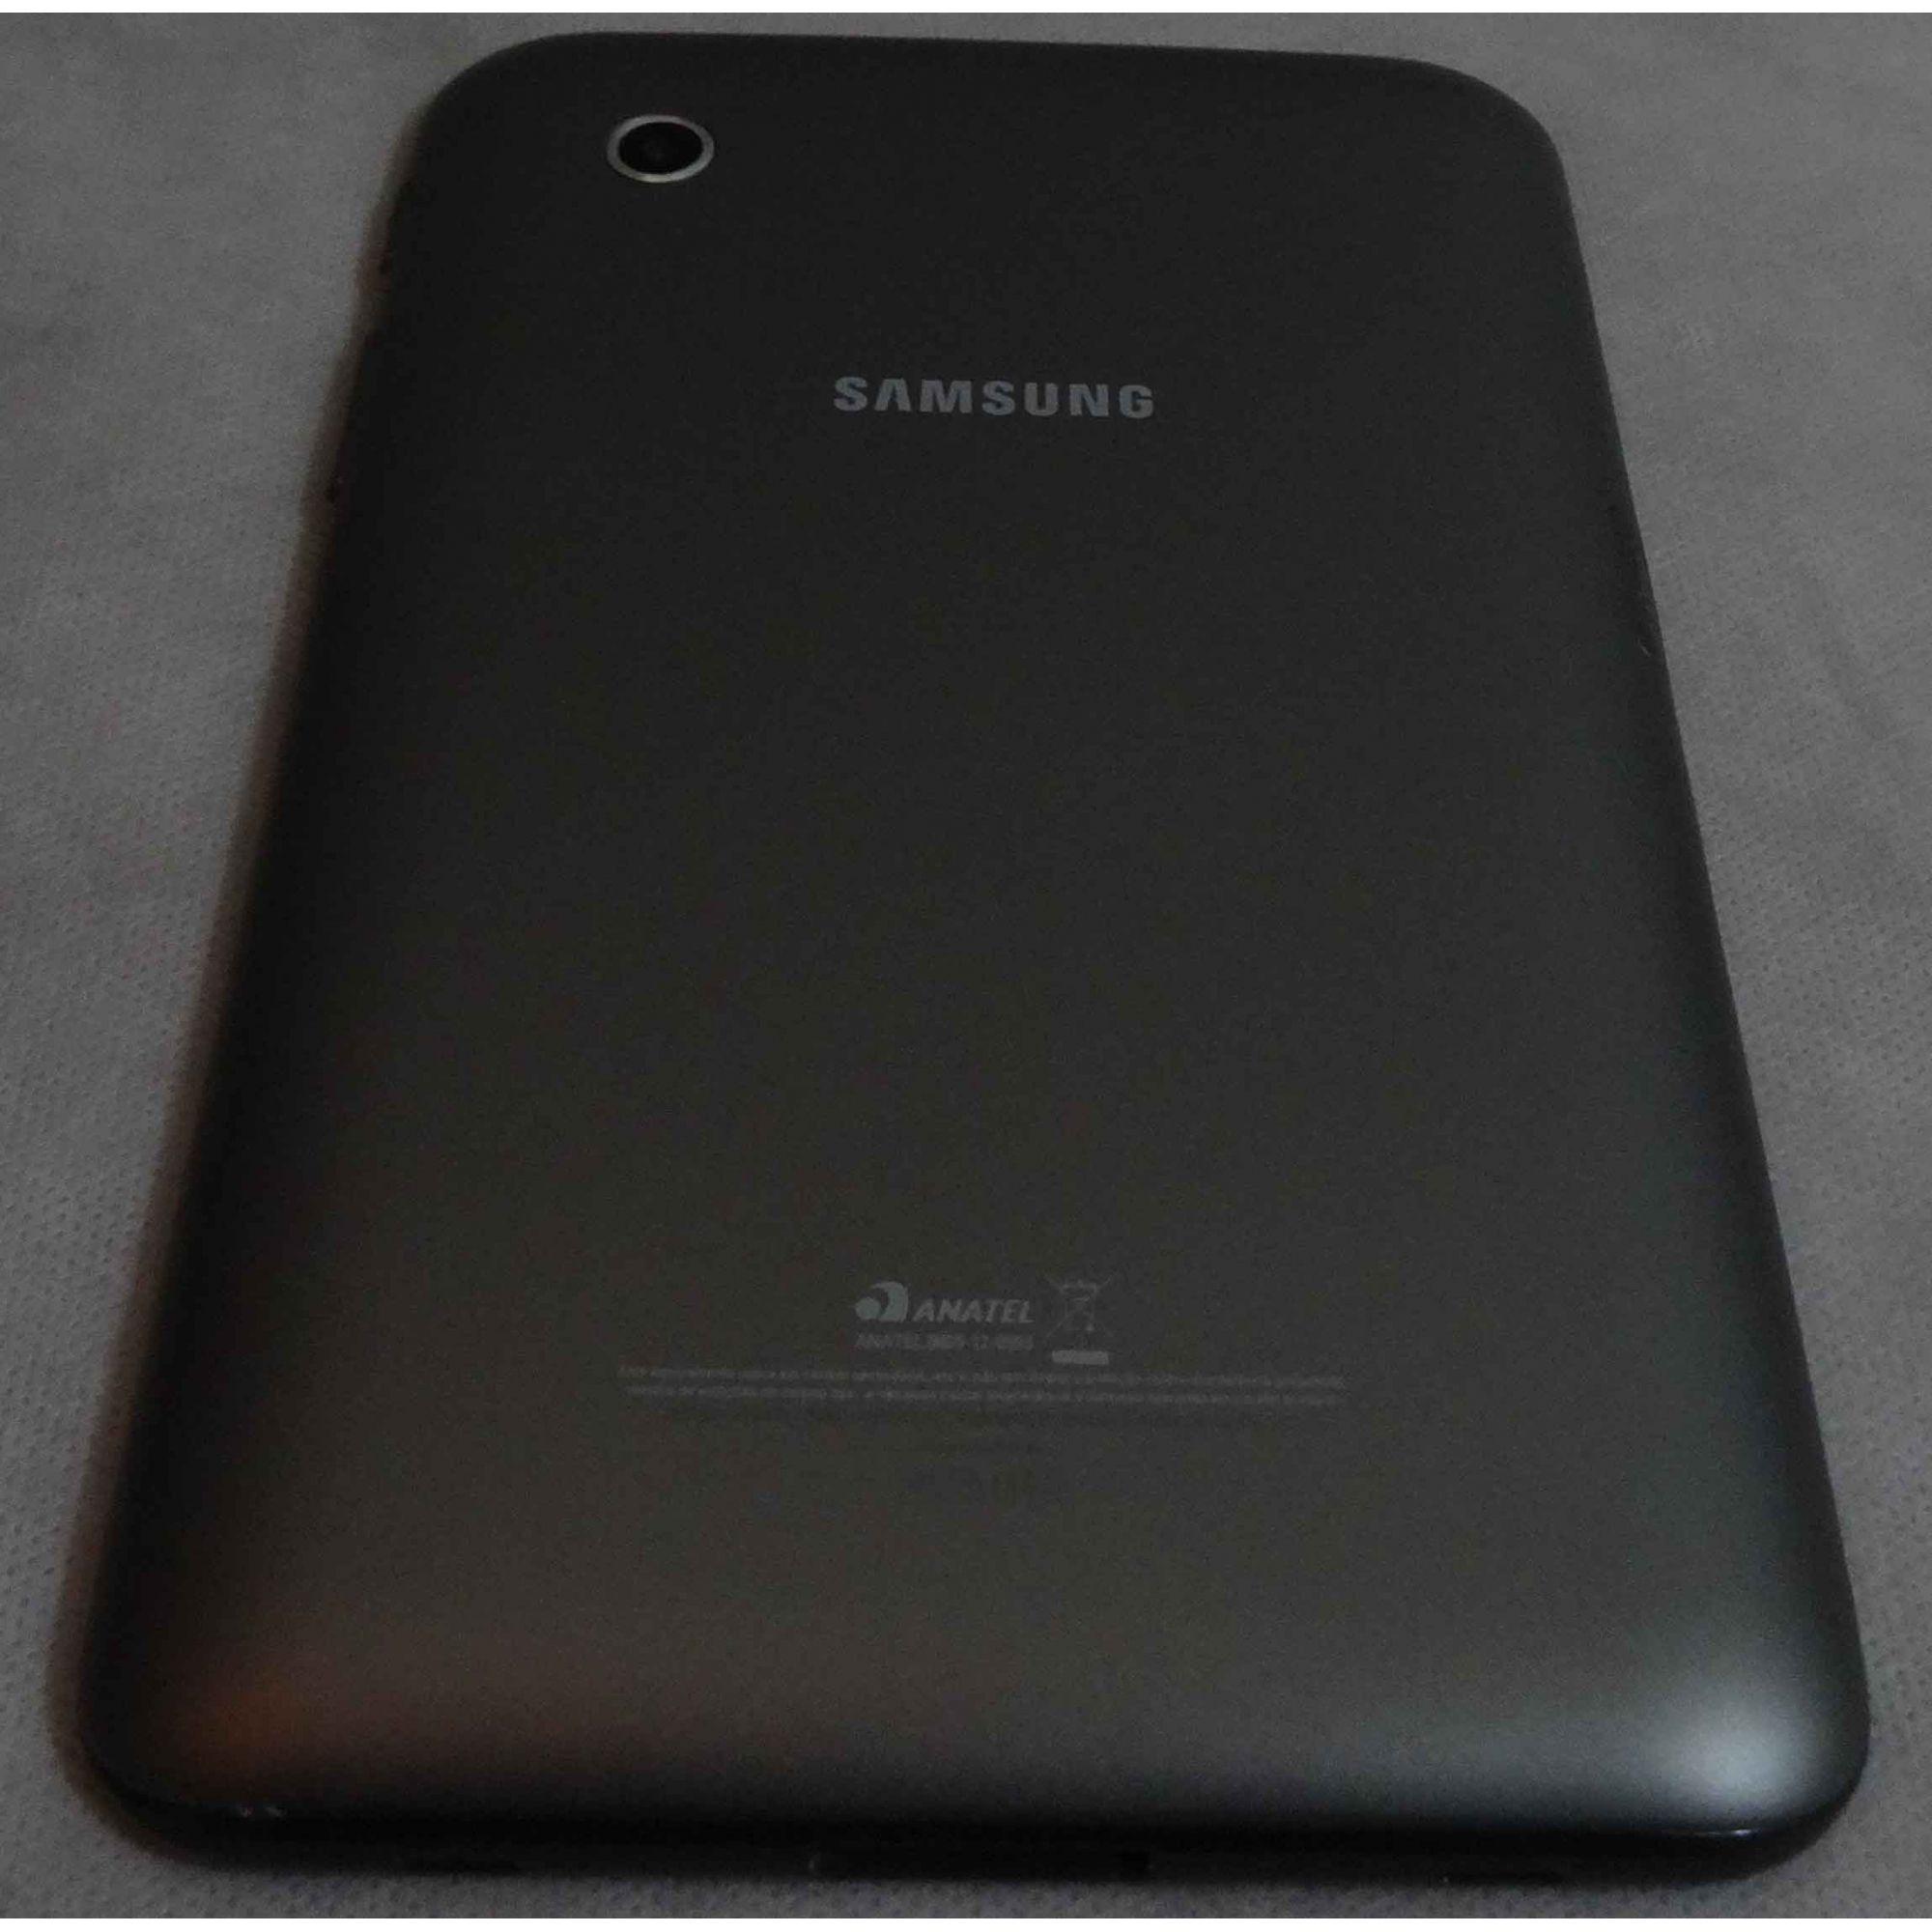 Tablet Samsung Galaxy Tab 2 GT-P3110 7 Polegadas 8GB, Wifi